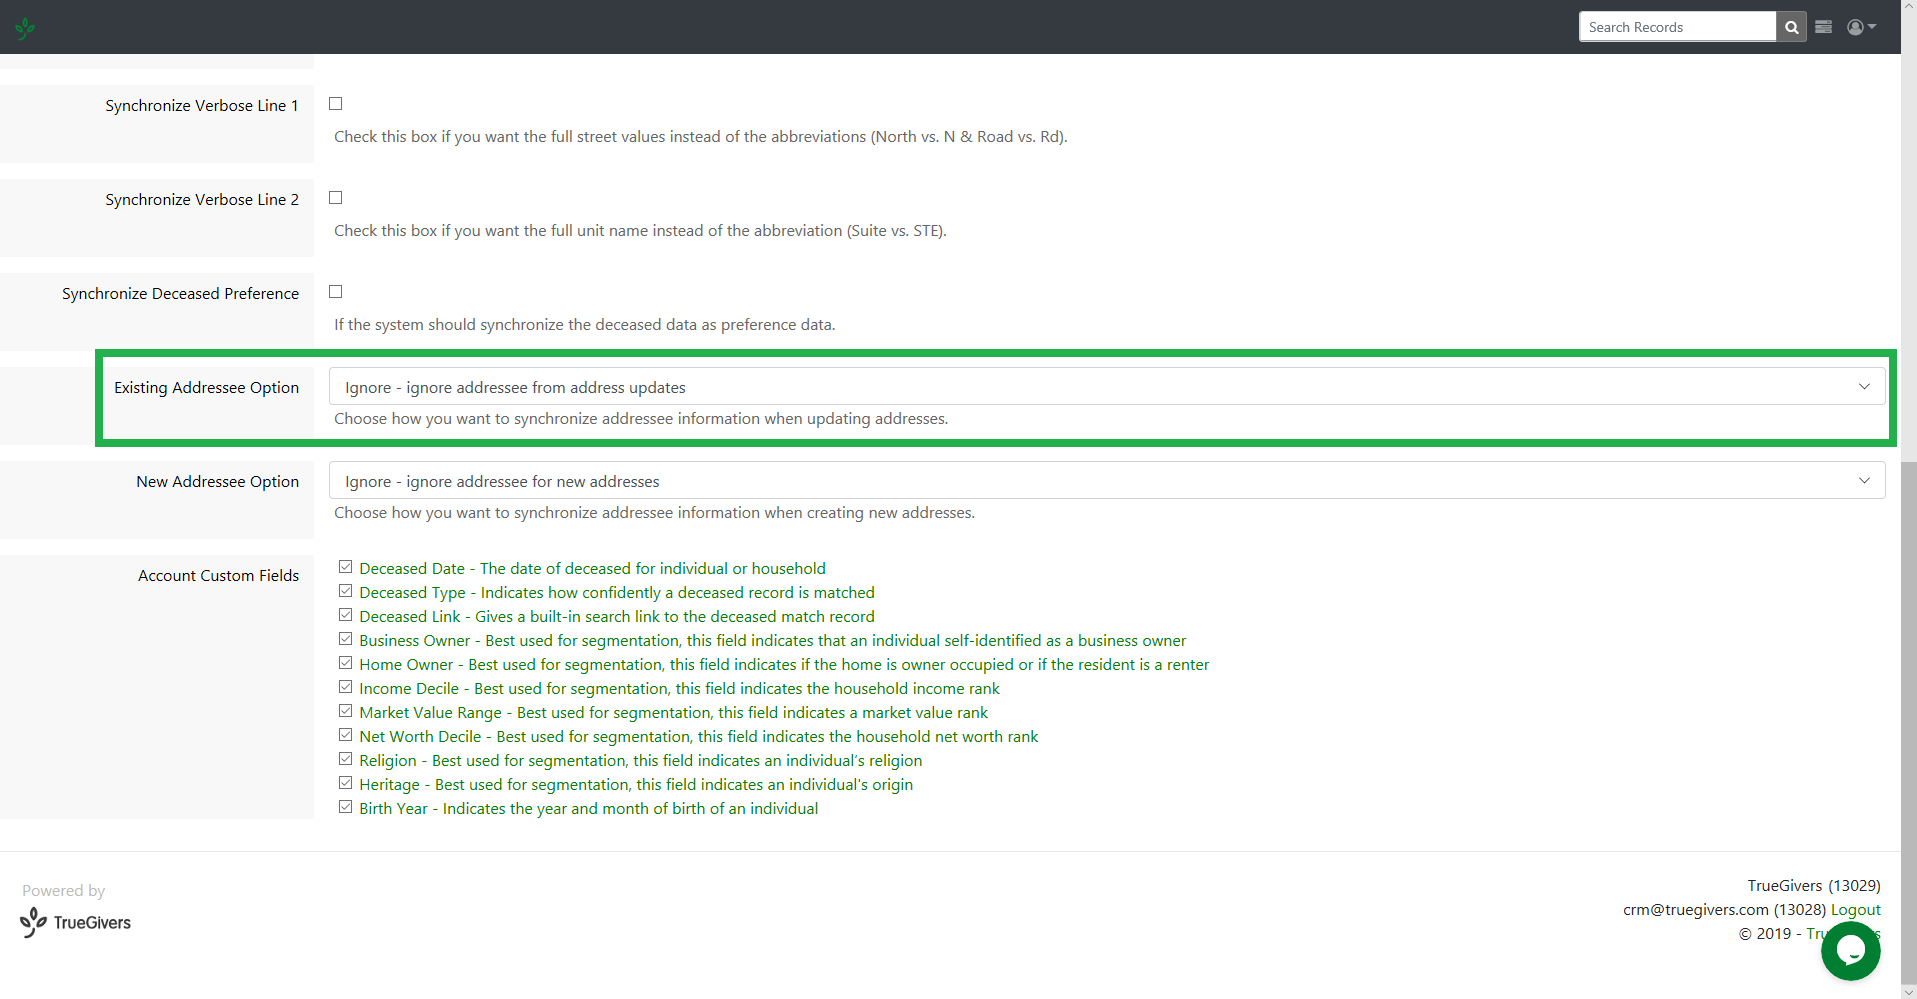 existing addressee option